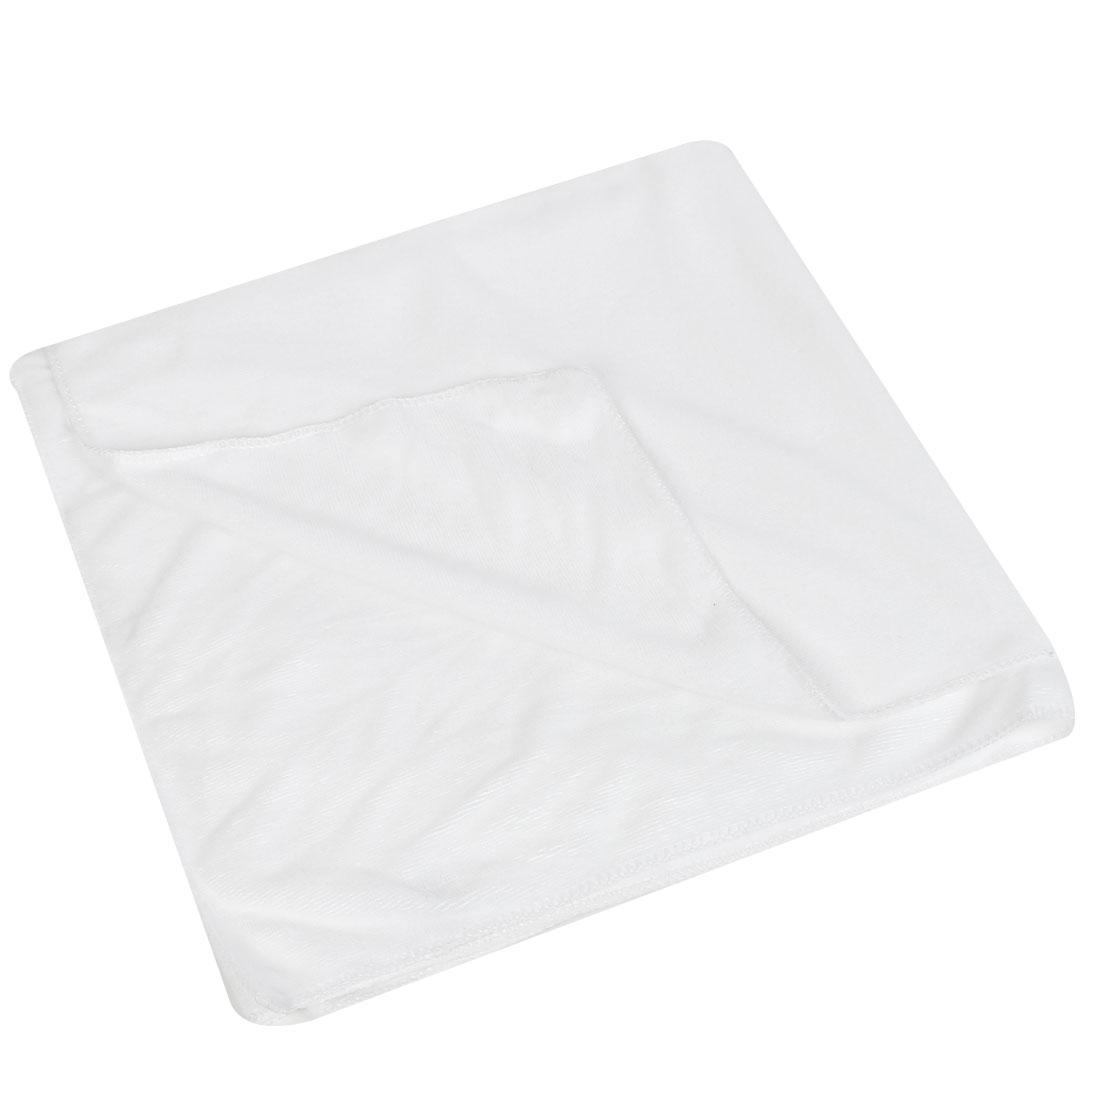 White Soft Terry Rectangle Shower Bath Towel Sheet 140cm x 70cm for Home Hotel